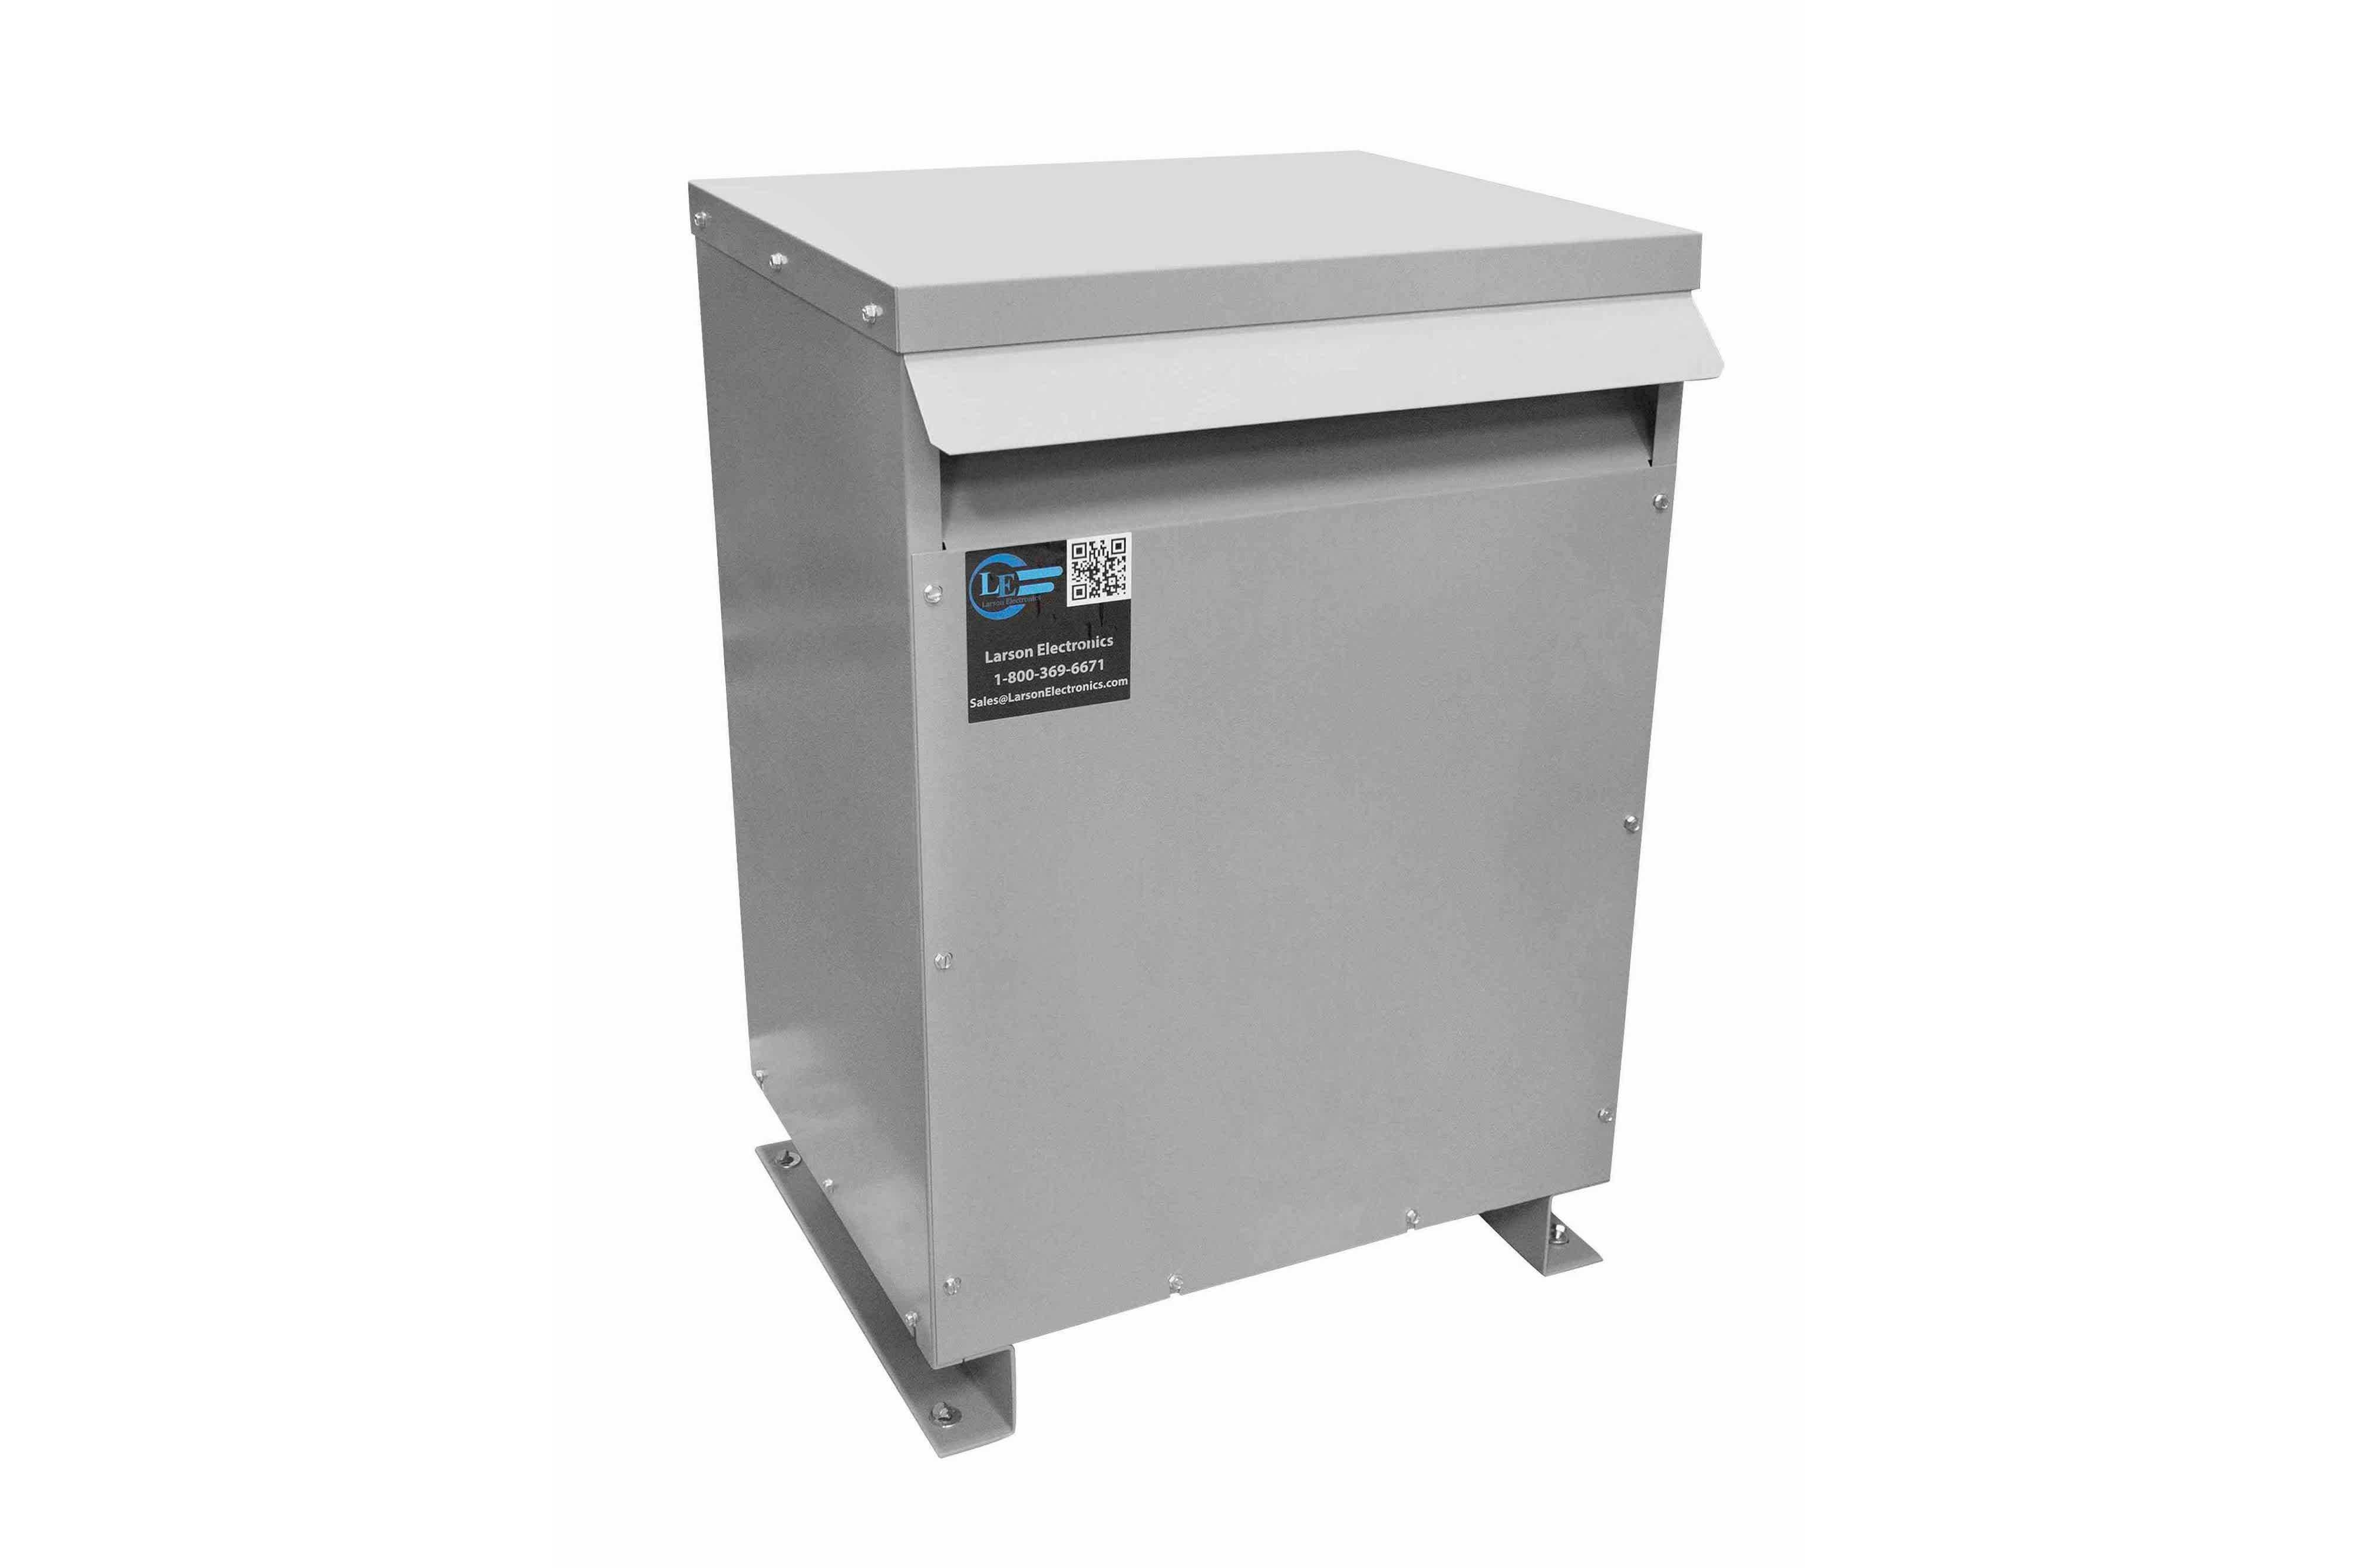 700 kVA 3PH Isolation Transformer, 480V Wye Primary, 208Y/120 Wye-N Secondary, N3R, Ventilated, 60 Hz